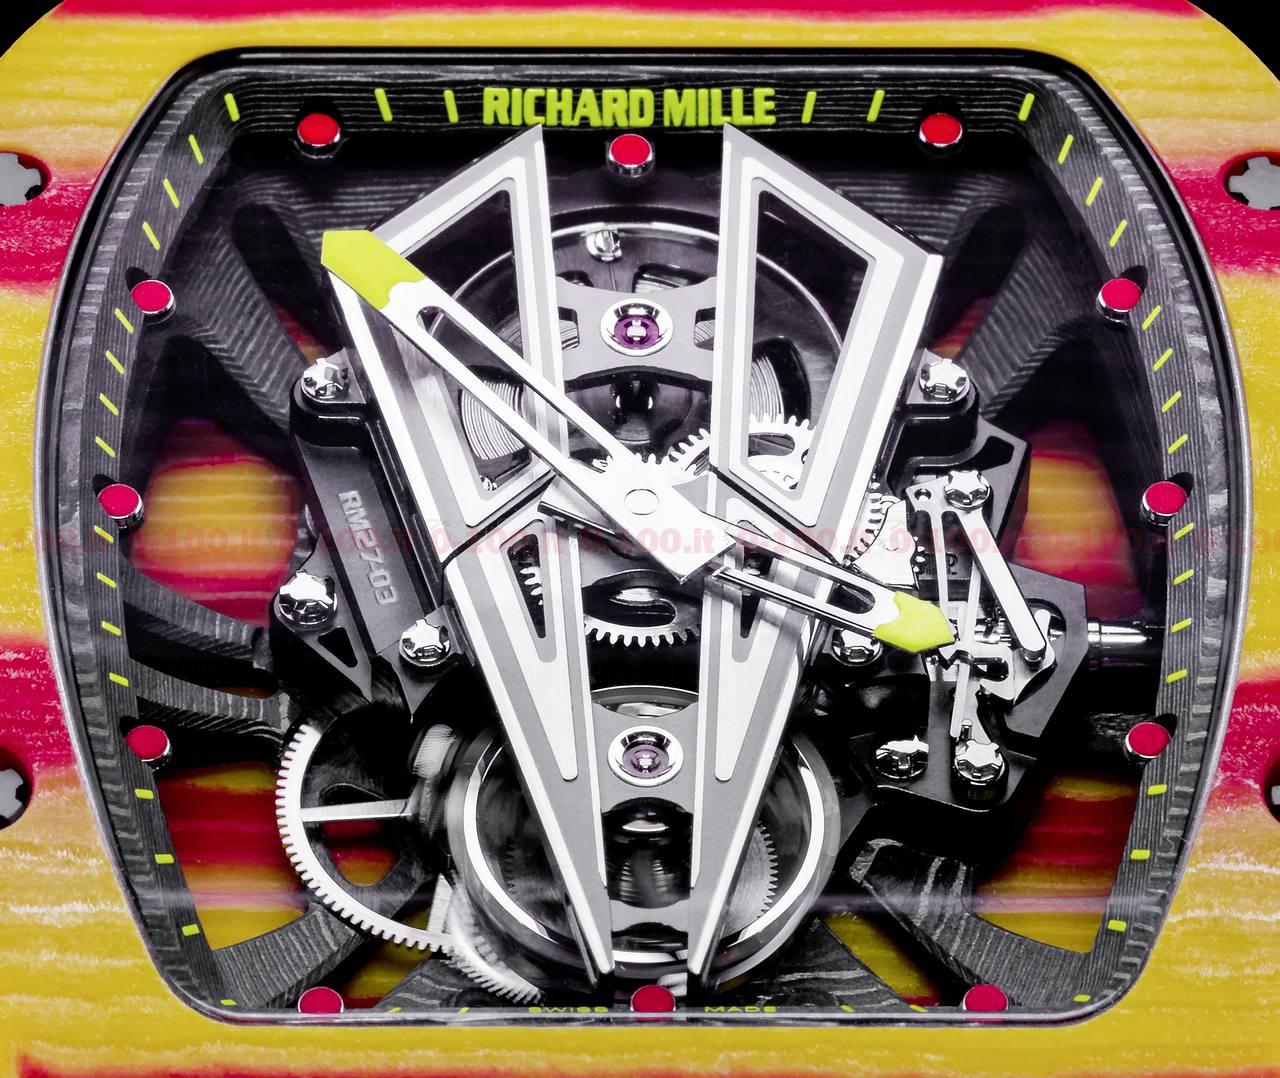 Richard Mille RM 27-03 Limited Edition_prezzo_price_0-1007